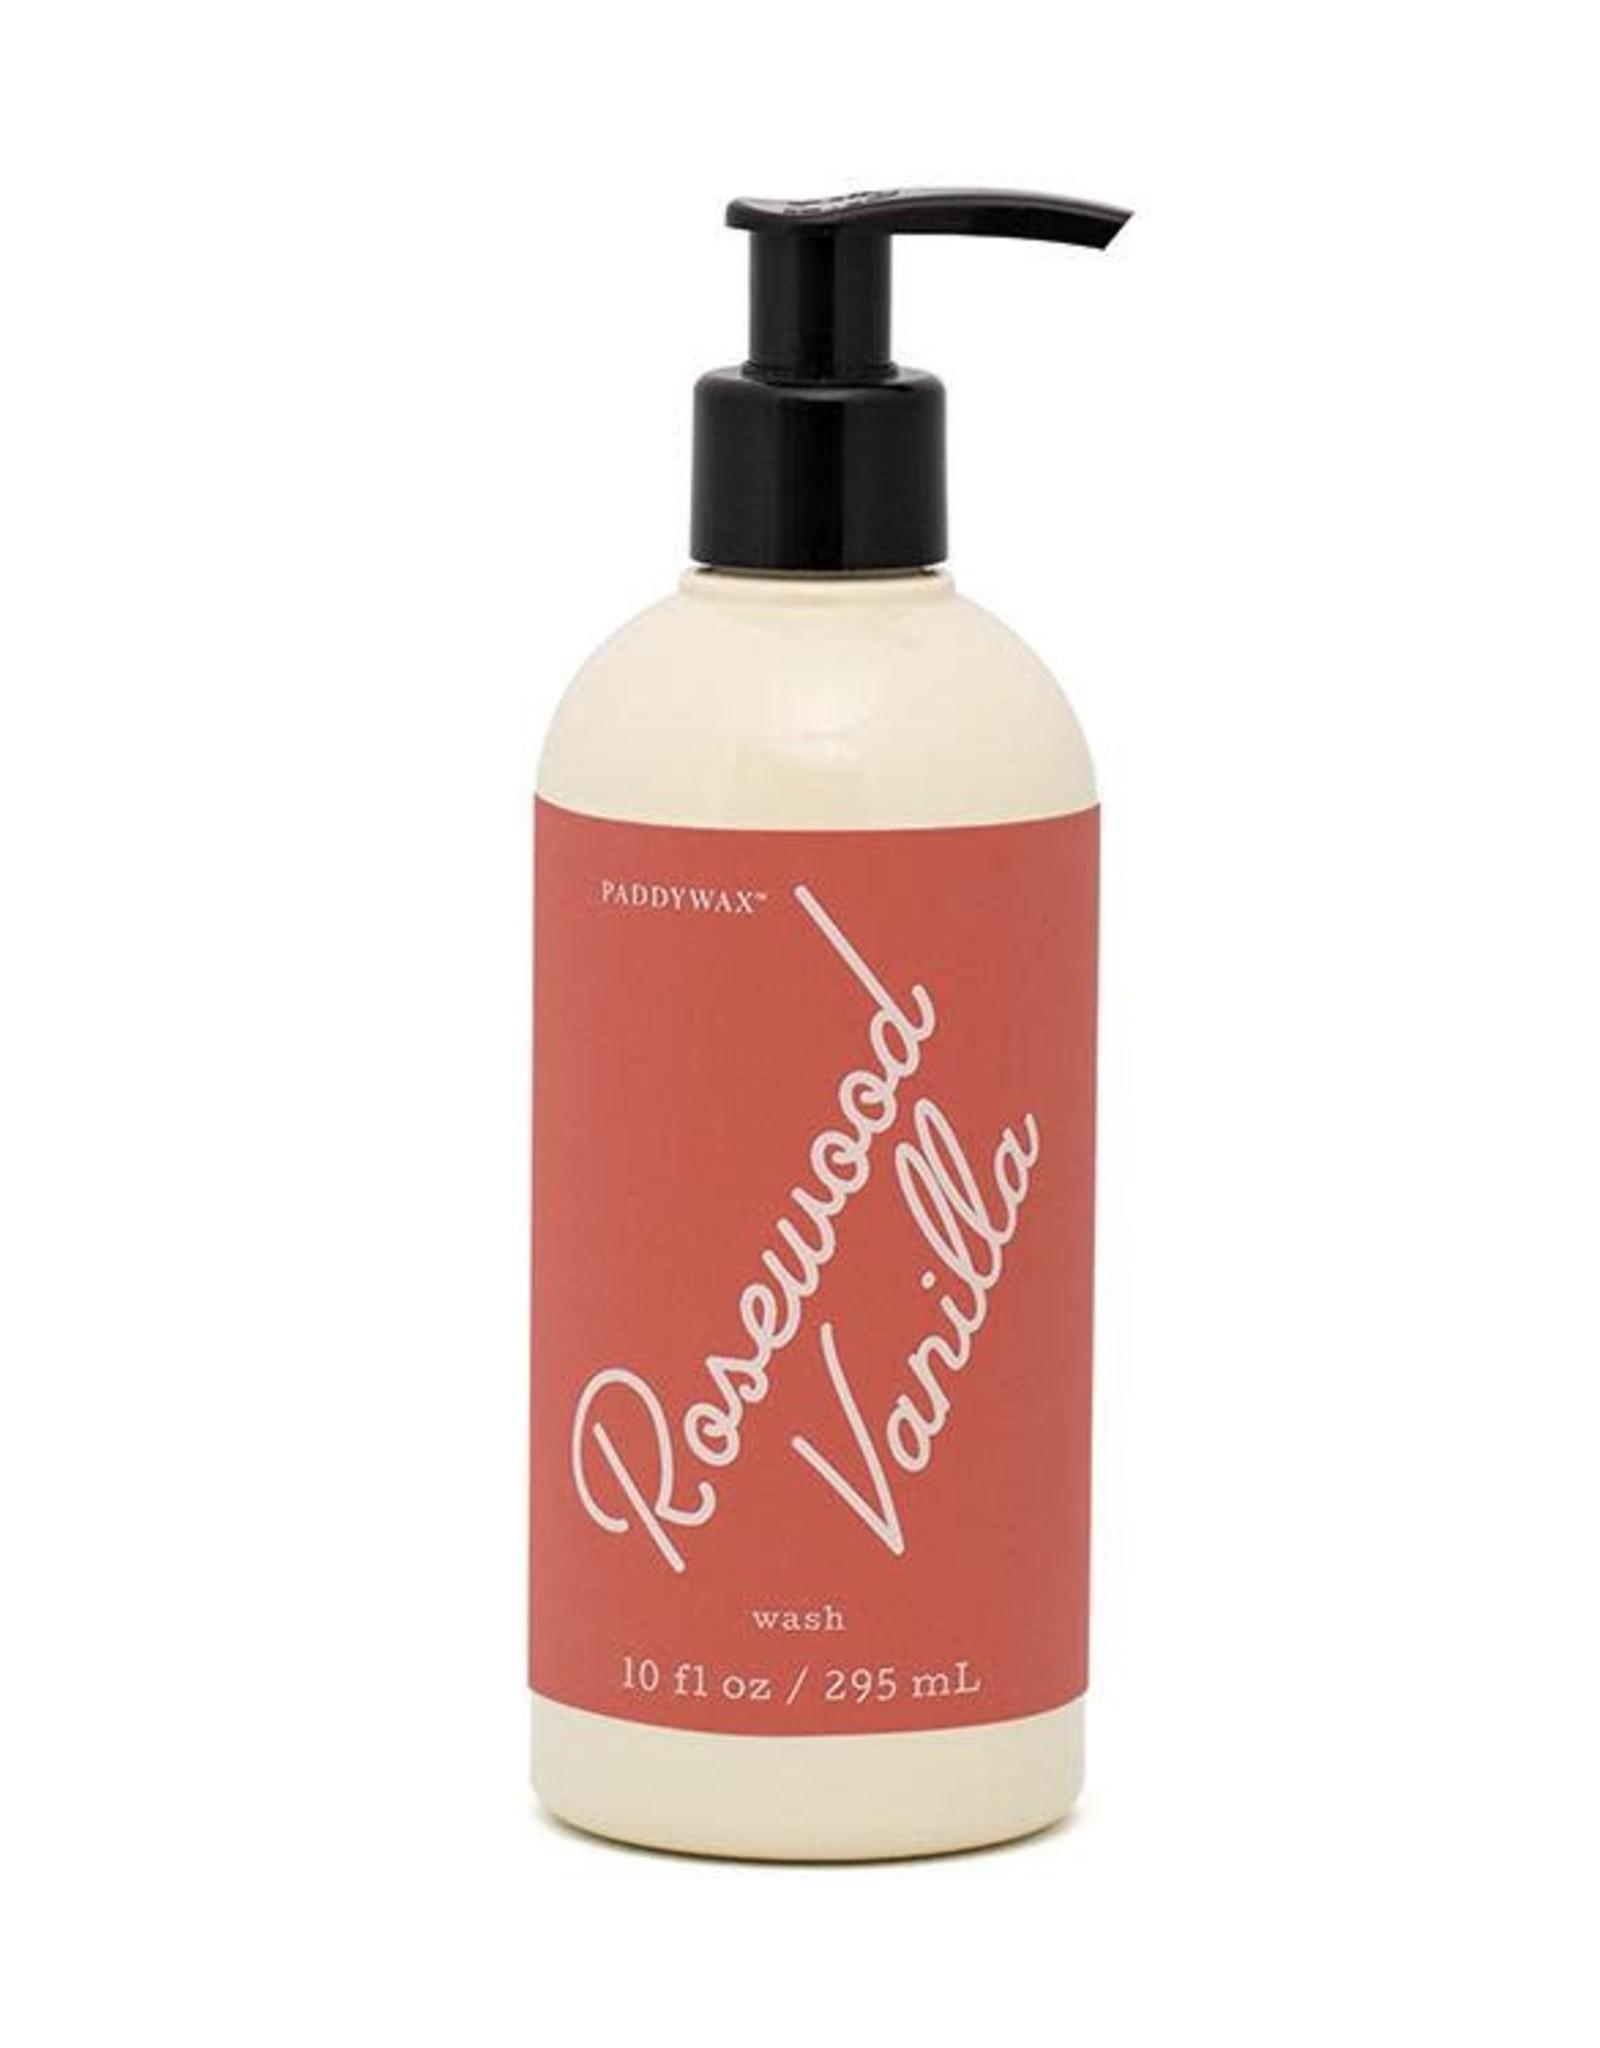 Paddywax Paddywax - Hand & Body Wash